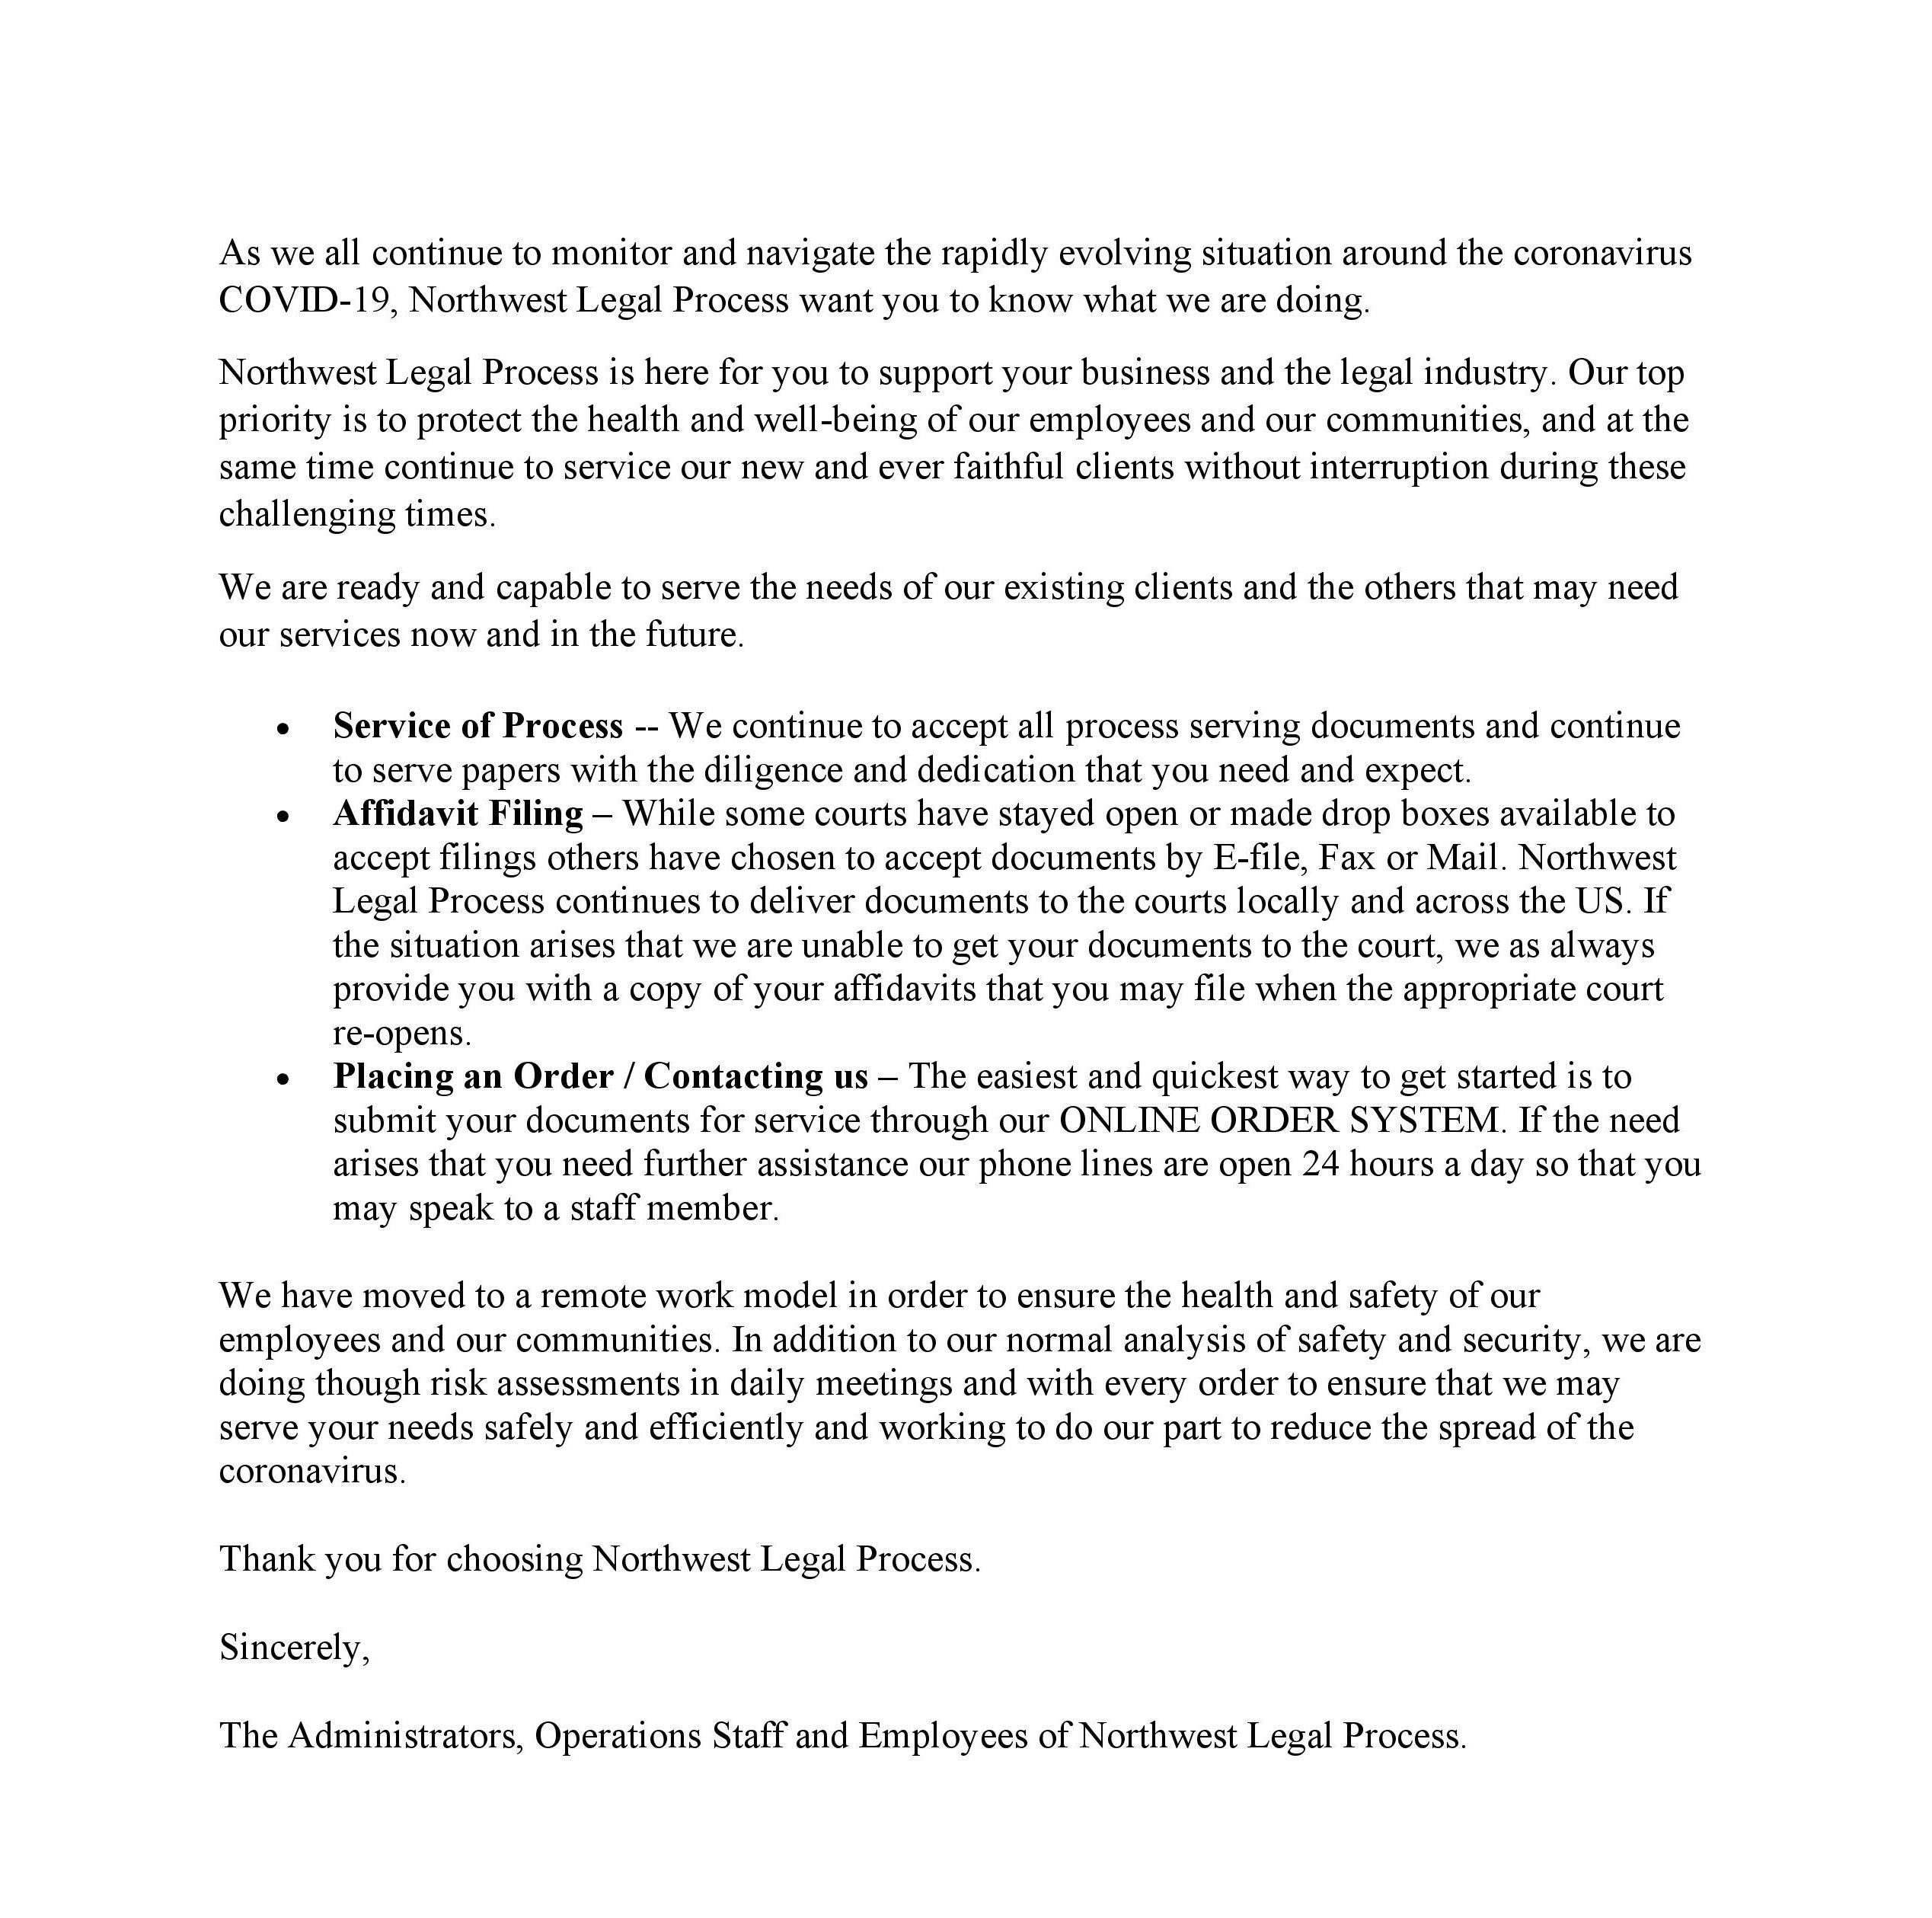 COVID-19-Statment